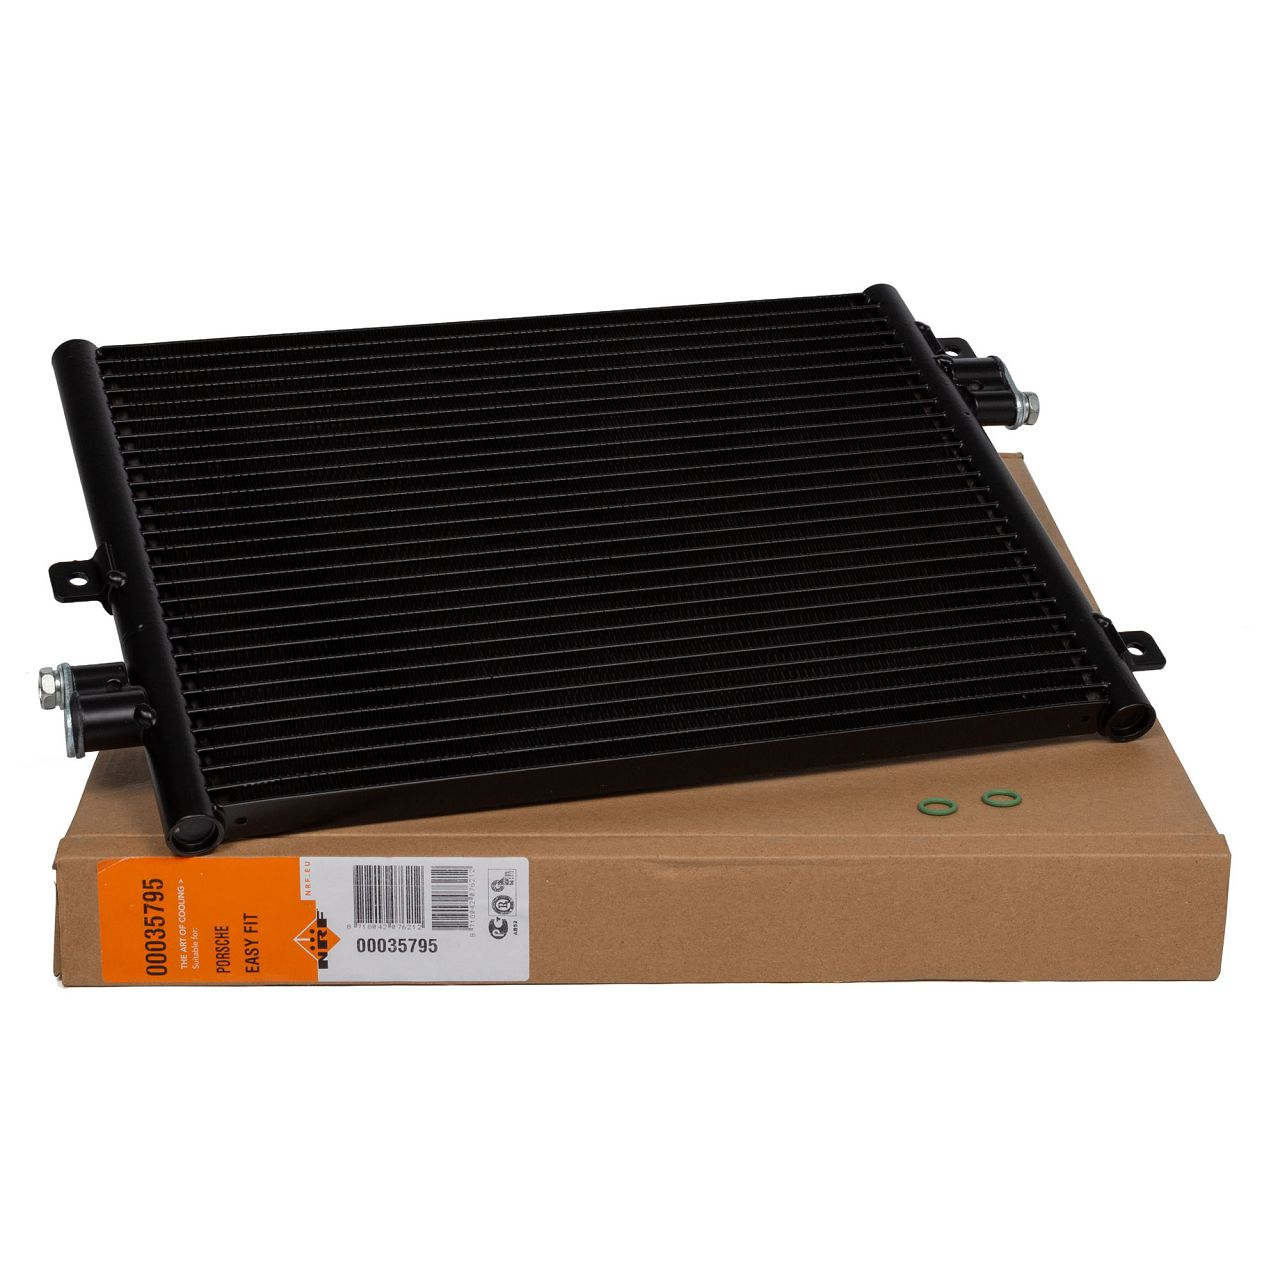 NRF 35795 Klimakondensator EASY FIT PORSCHE 911 996 997 Boxster 986 Cayman 987 99657311102